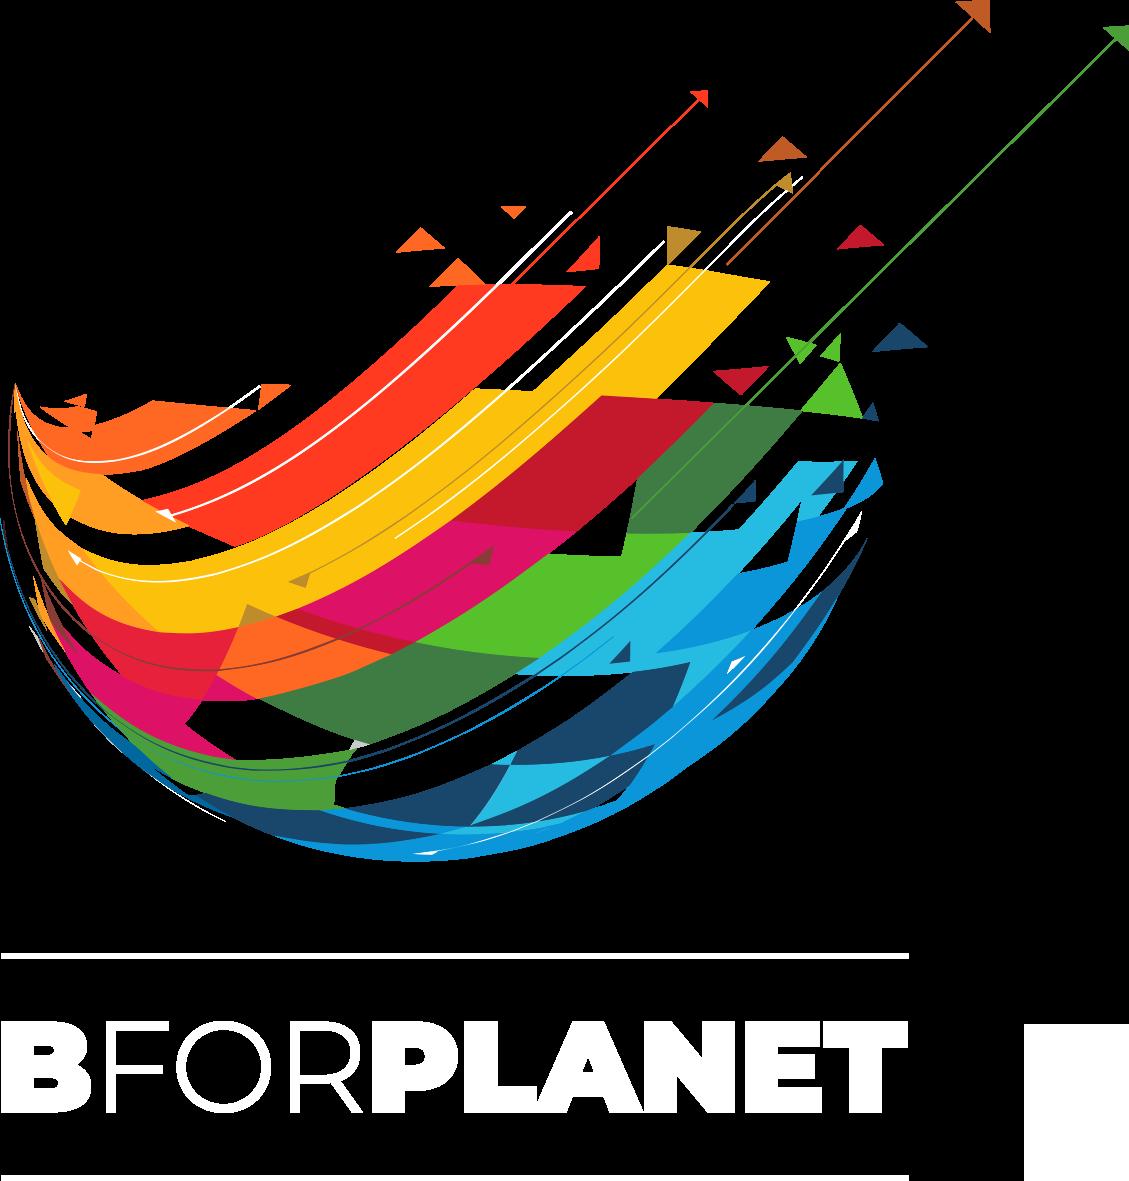 BforPlanet_logo_white